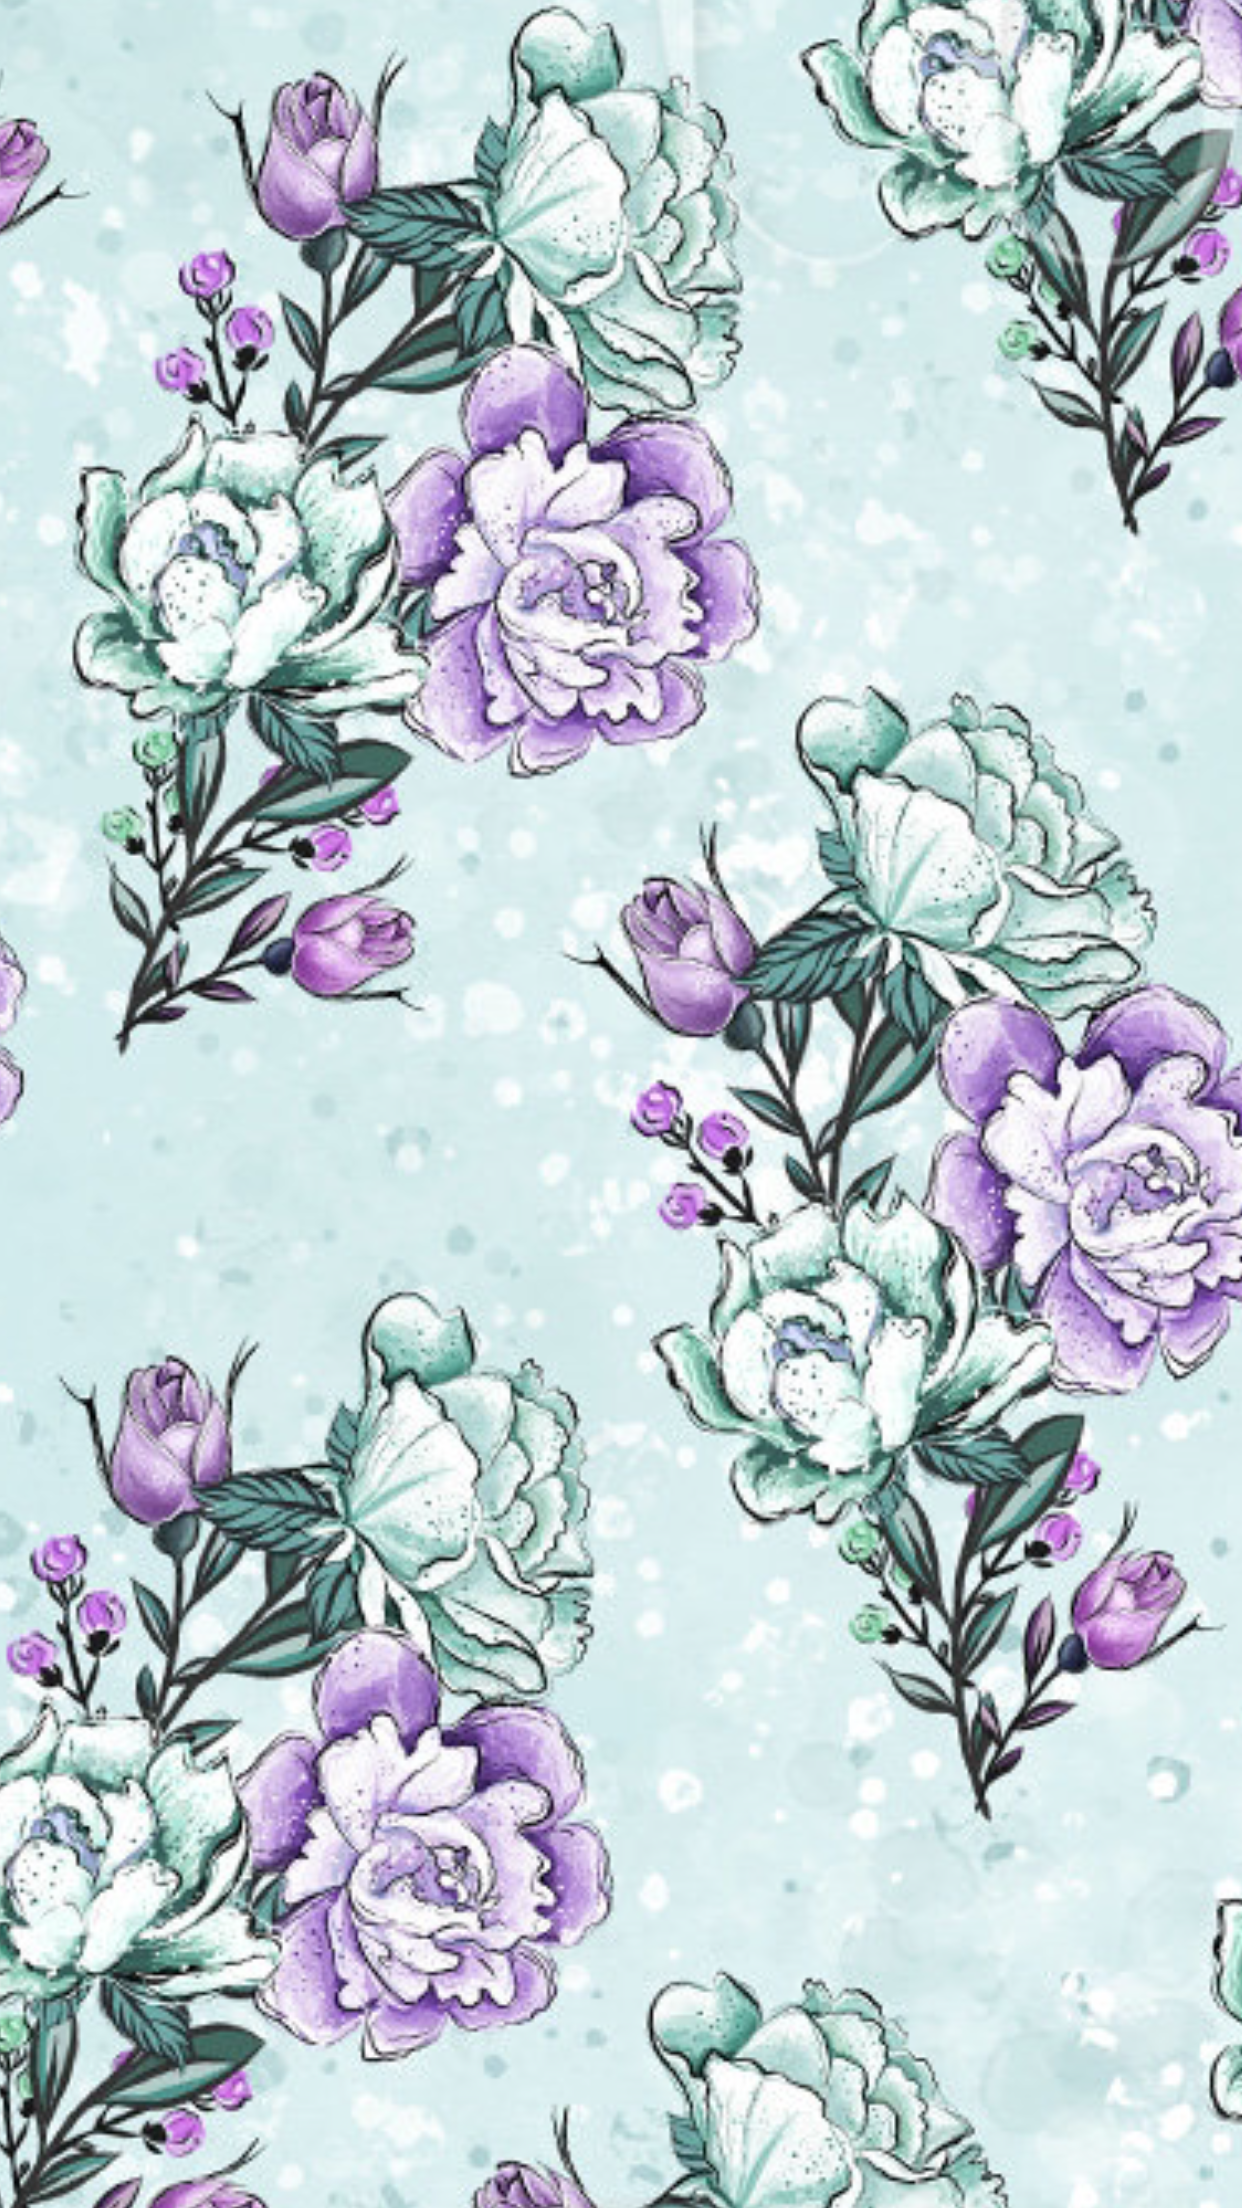 Pin by Erin Kolles on wallpapers | Flowery wallpaper ...